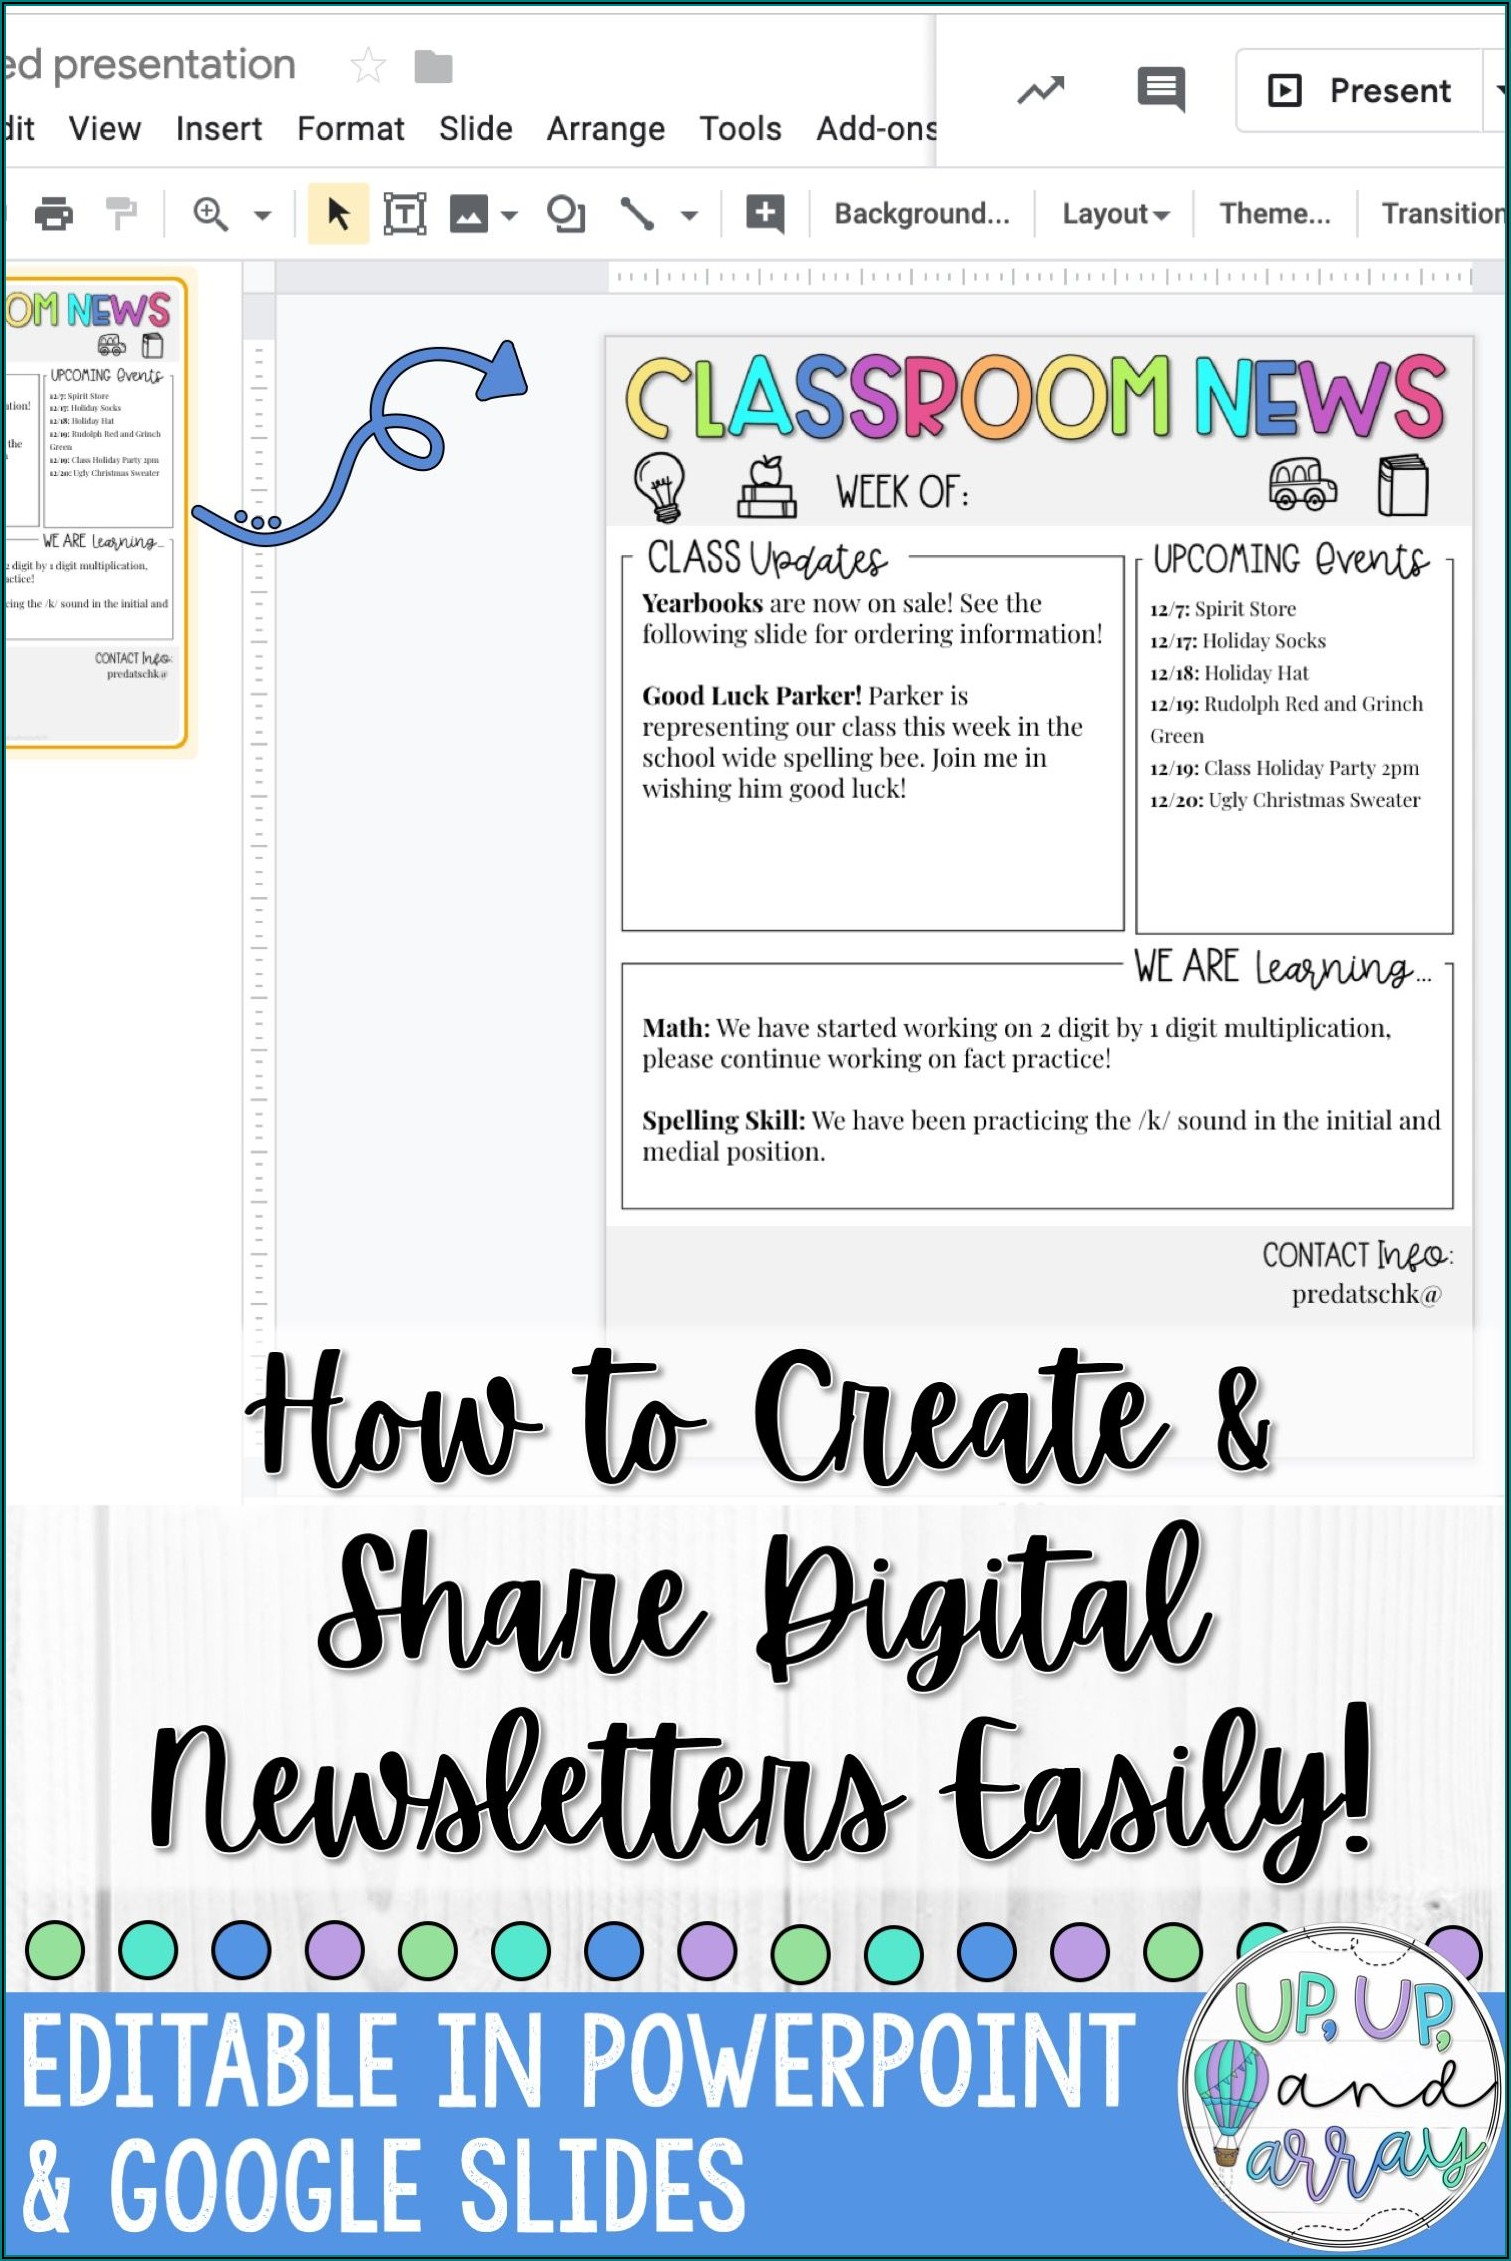 Weekly School Newsletter Template